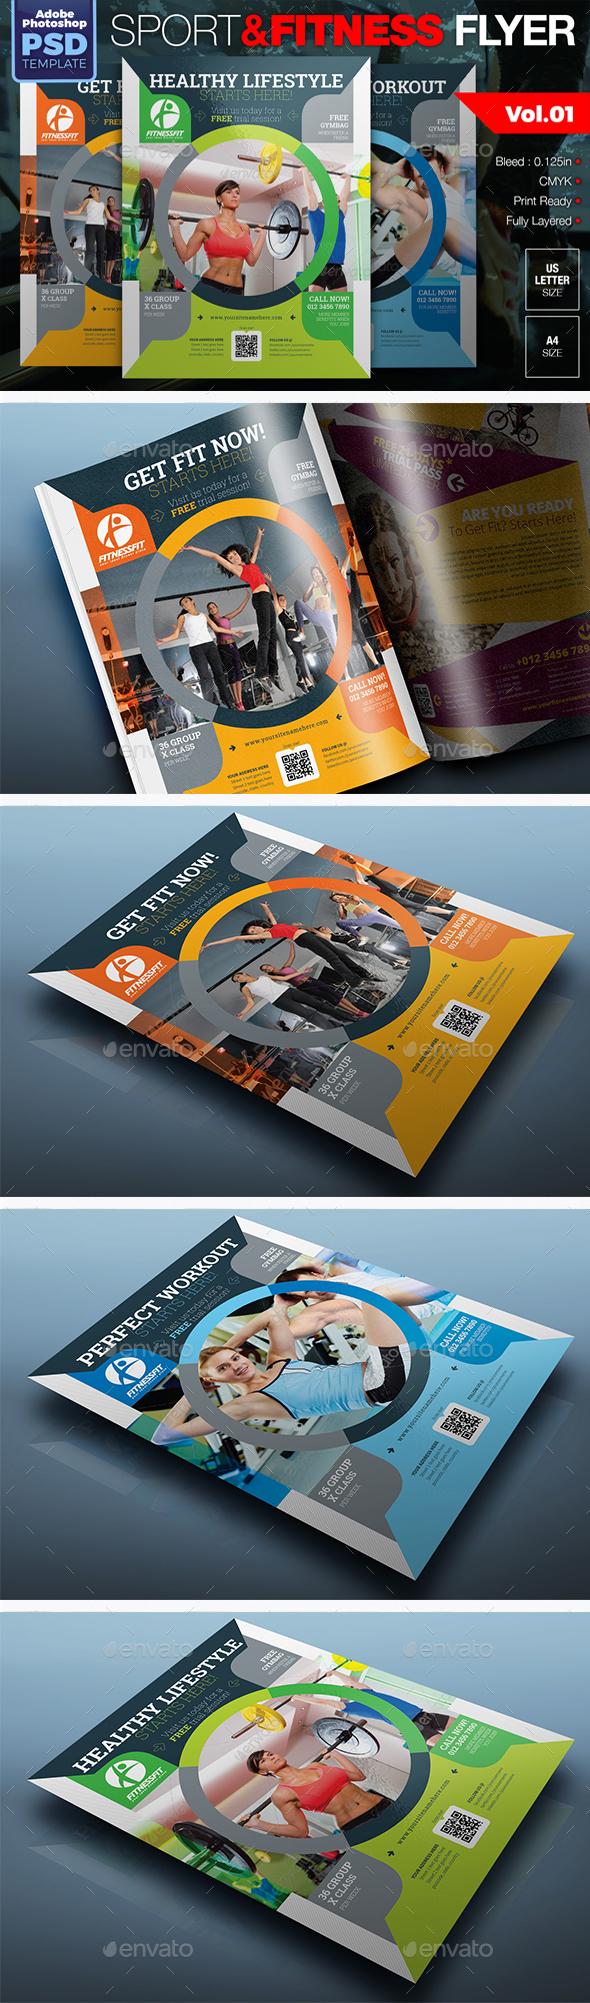 Sport & Fitness Flyer Vol.01